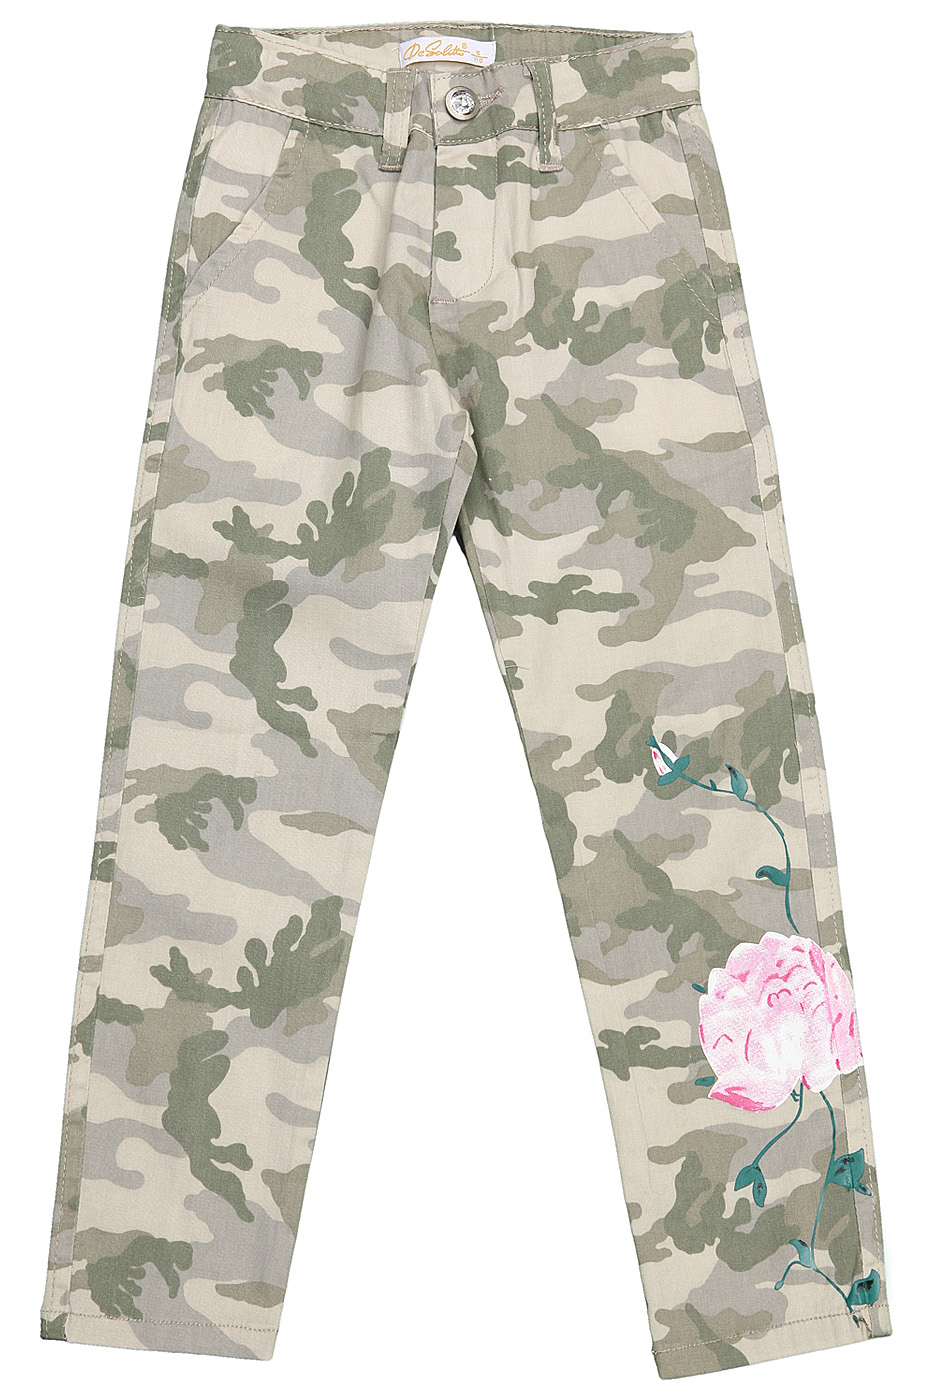 Брюки Desalitto Army Roses